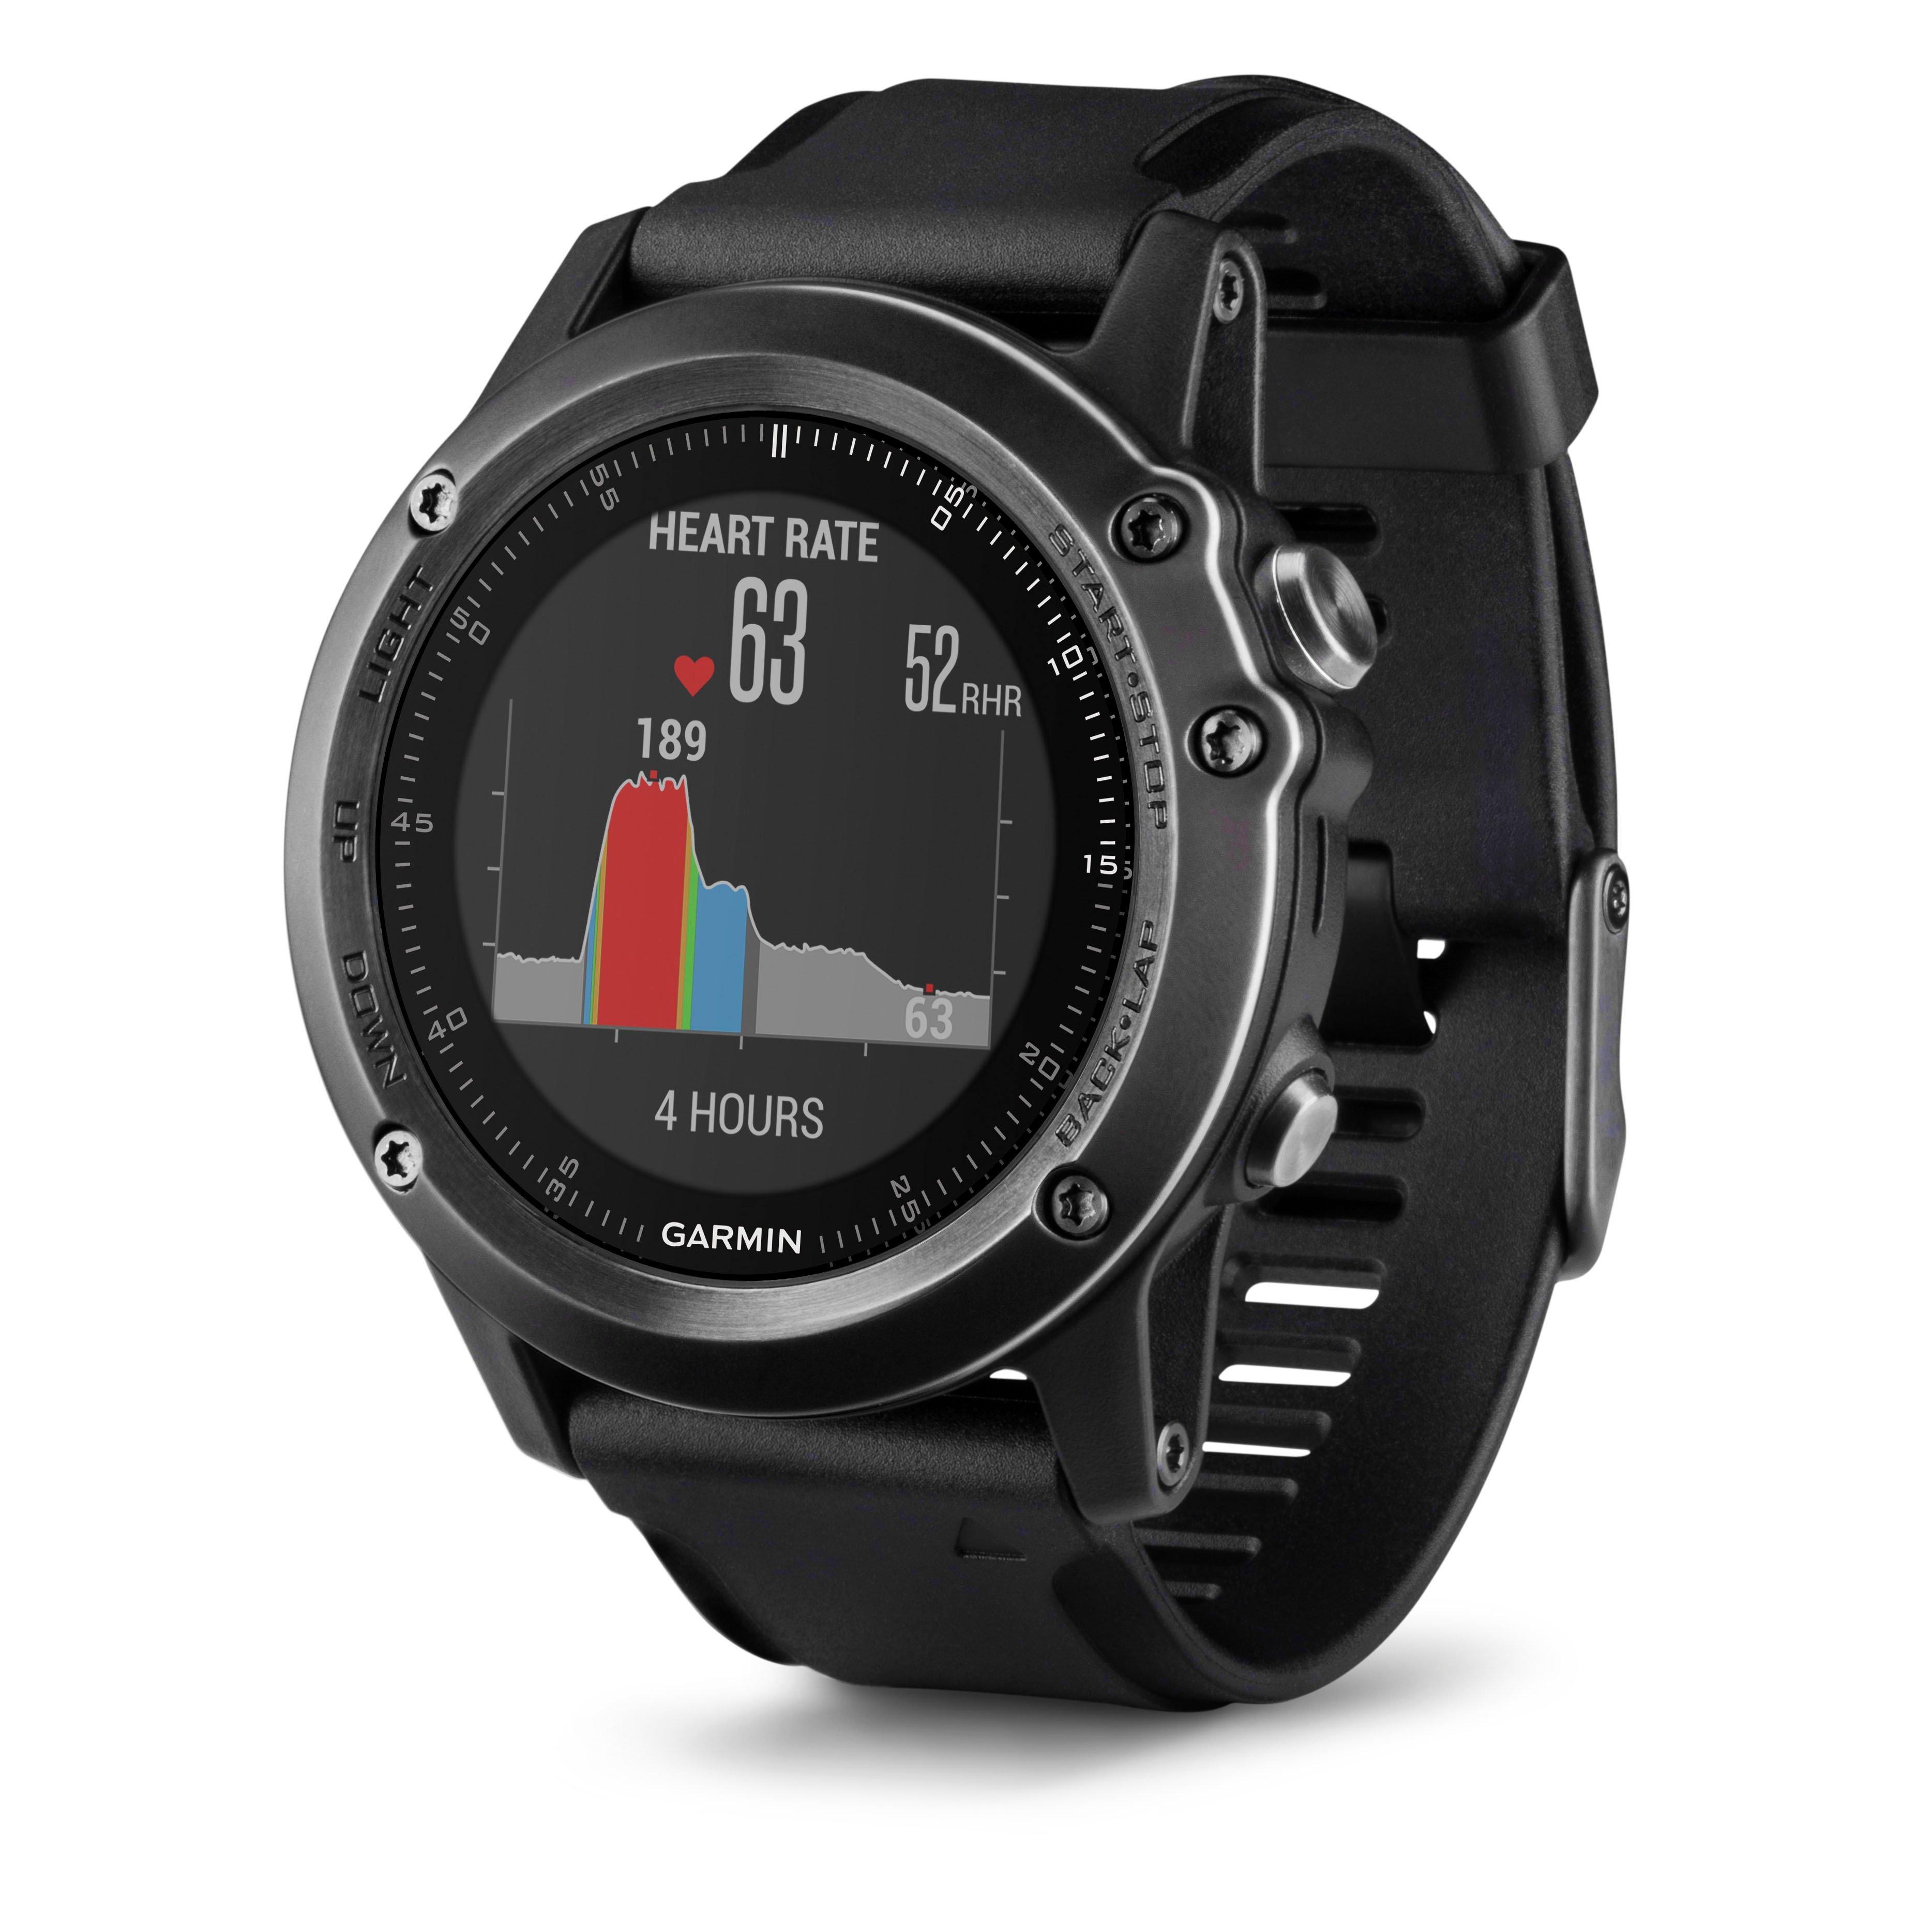 Garmin fenix 3 Sapphire HR Watch Black